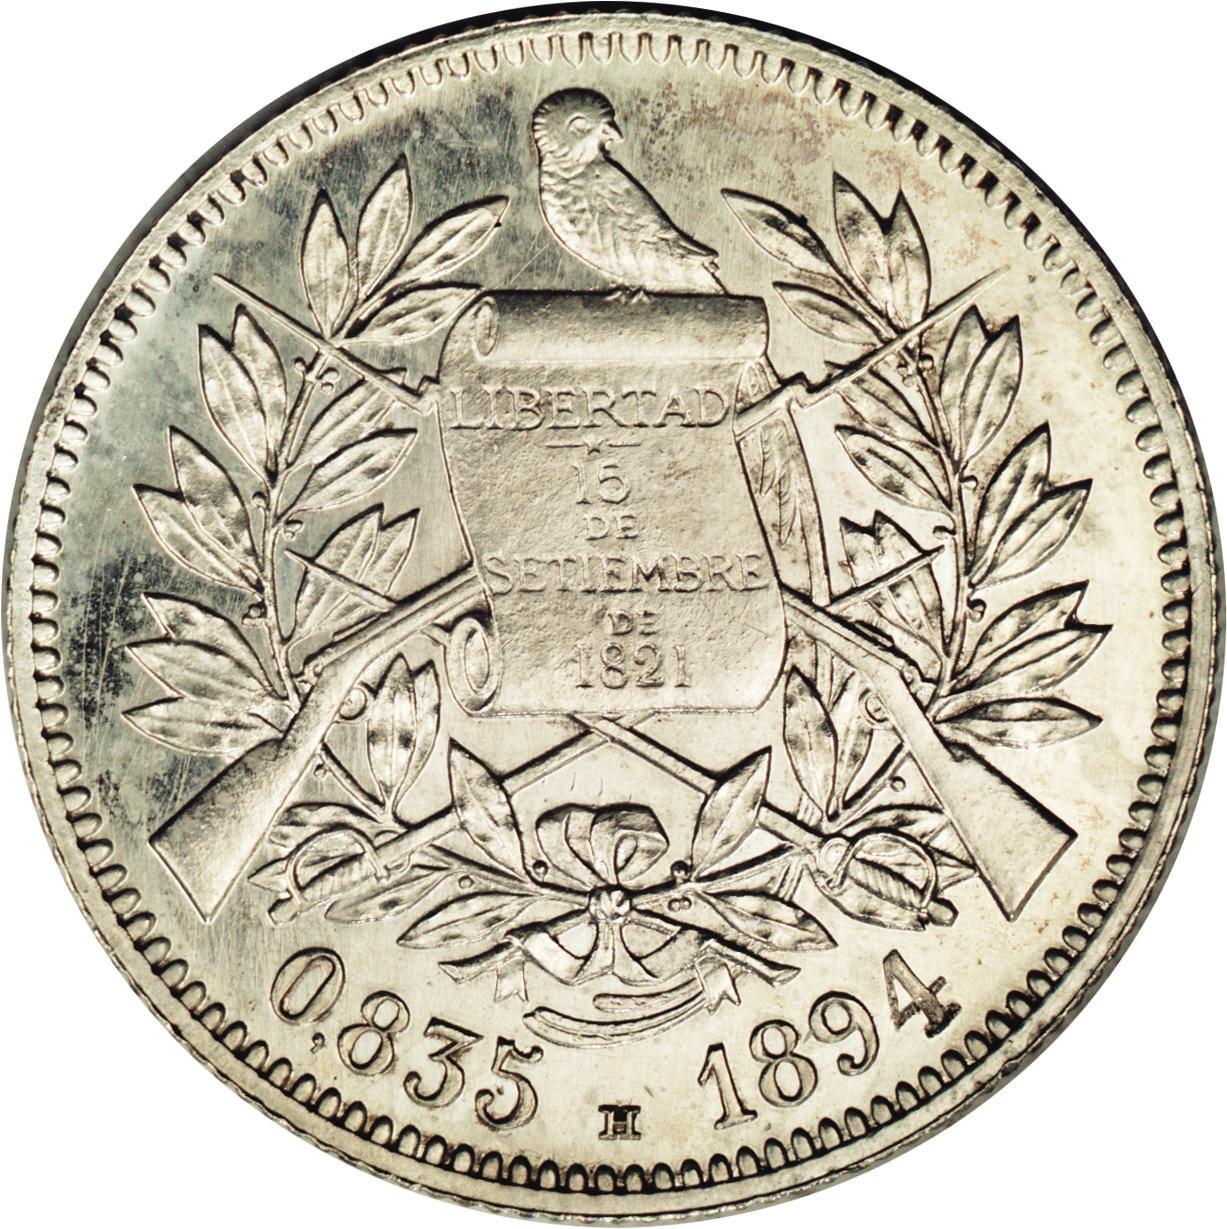 2 Reales - Guatemala – Numista